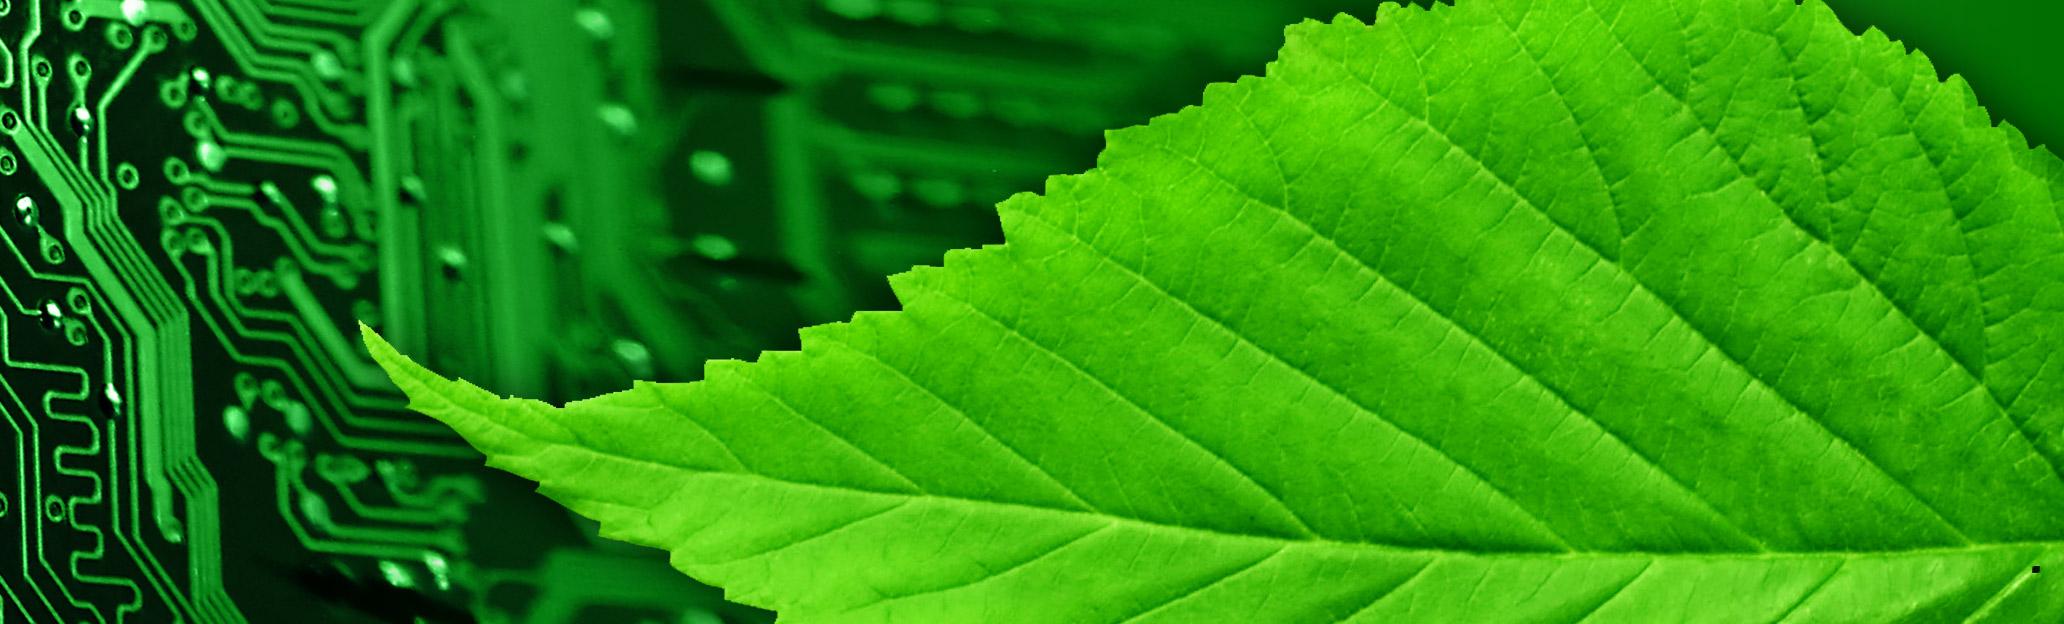 eco leaf